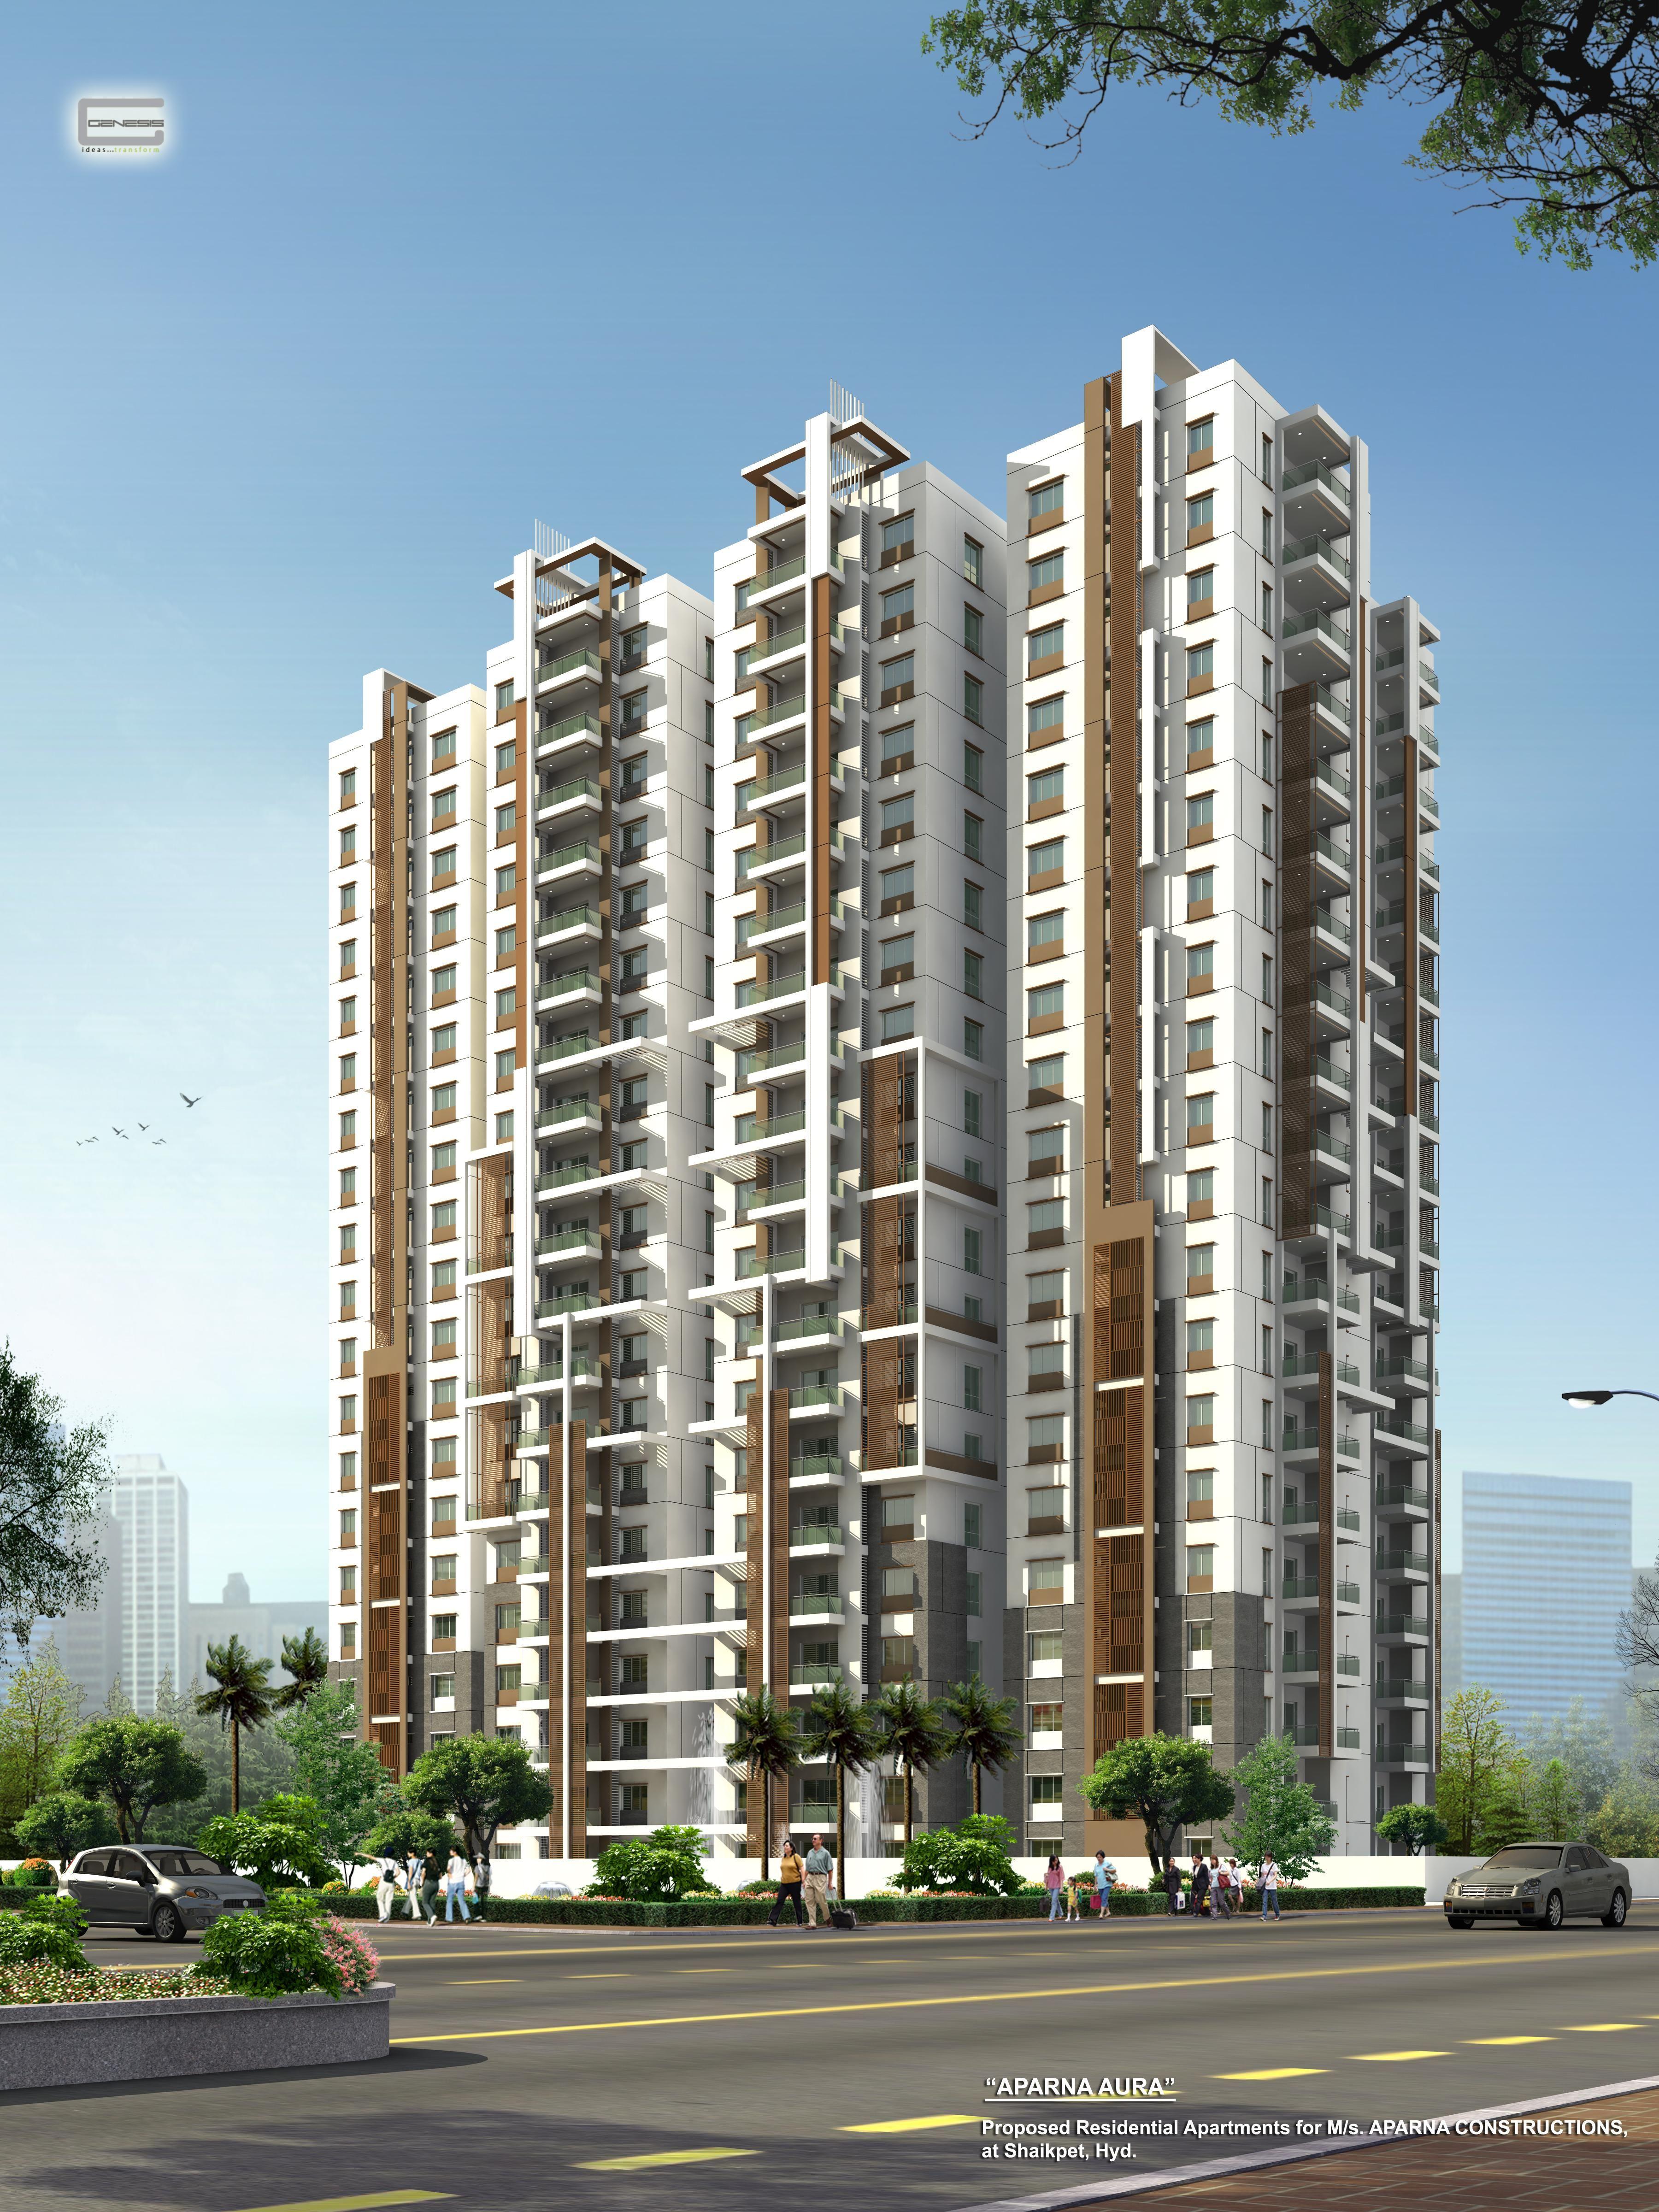 Aparna Constructions | Aparna Aura | Tower View -  www.aparnaconstructions.com